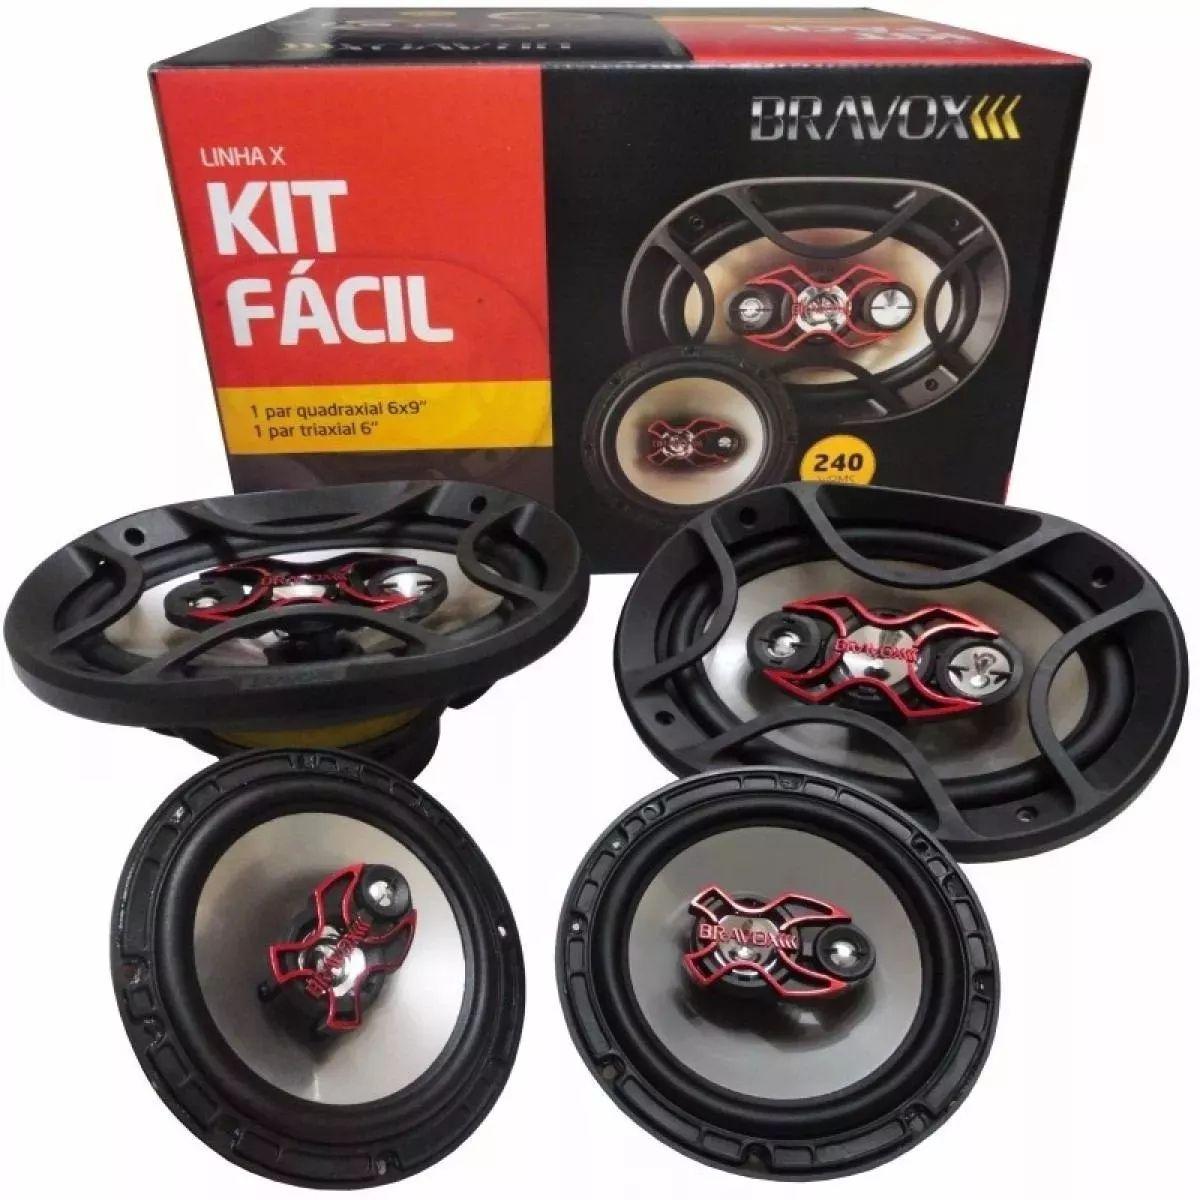 Kit Fácil Linha X Bravox B4X69 X + B3X60 X - 100W + 140W RMS